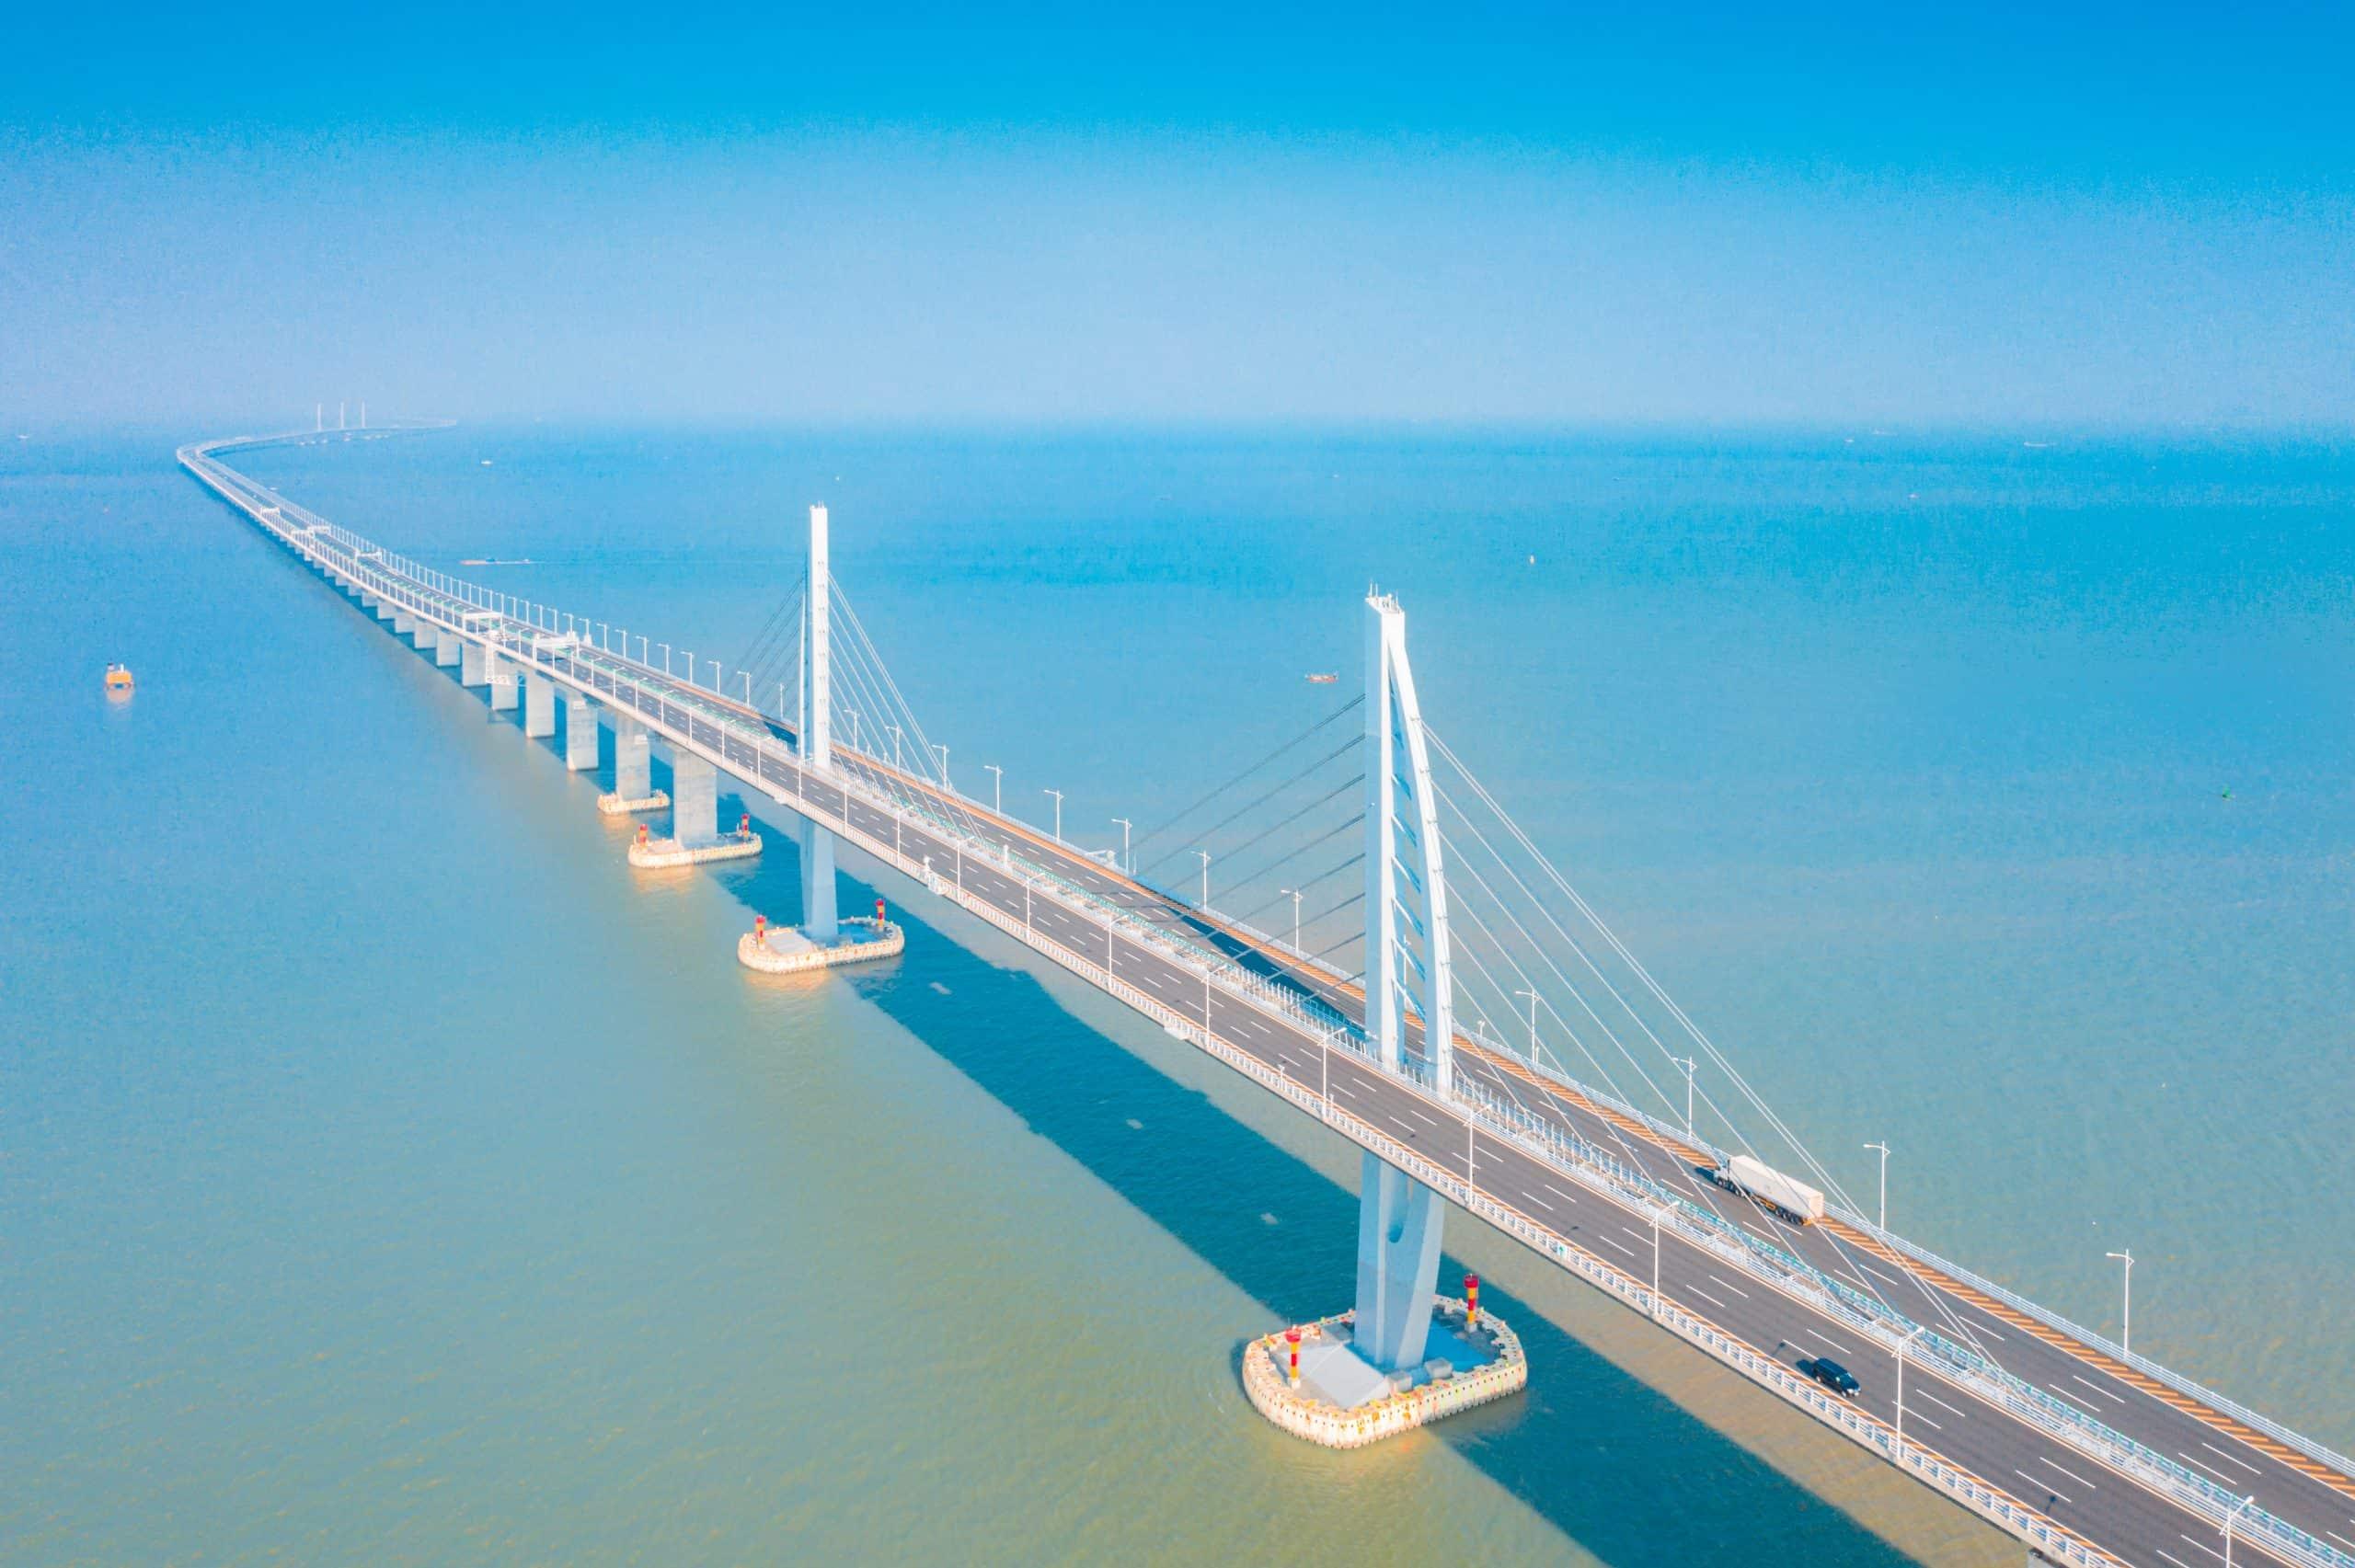 Aerial scenery of the Zhuhai section of the Hong Kong-Zhuhai-Macao Bridge in China